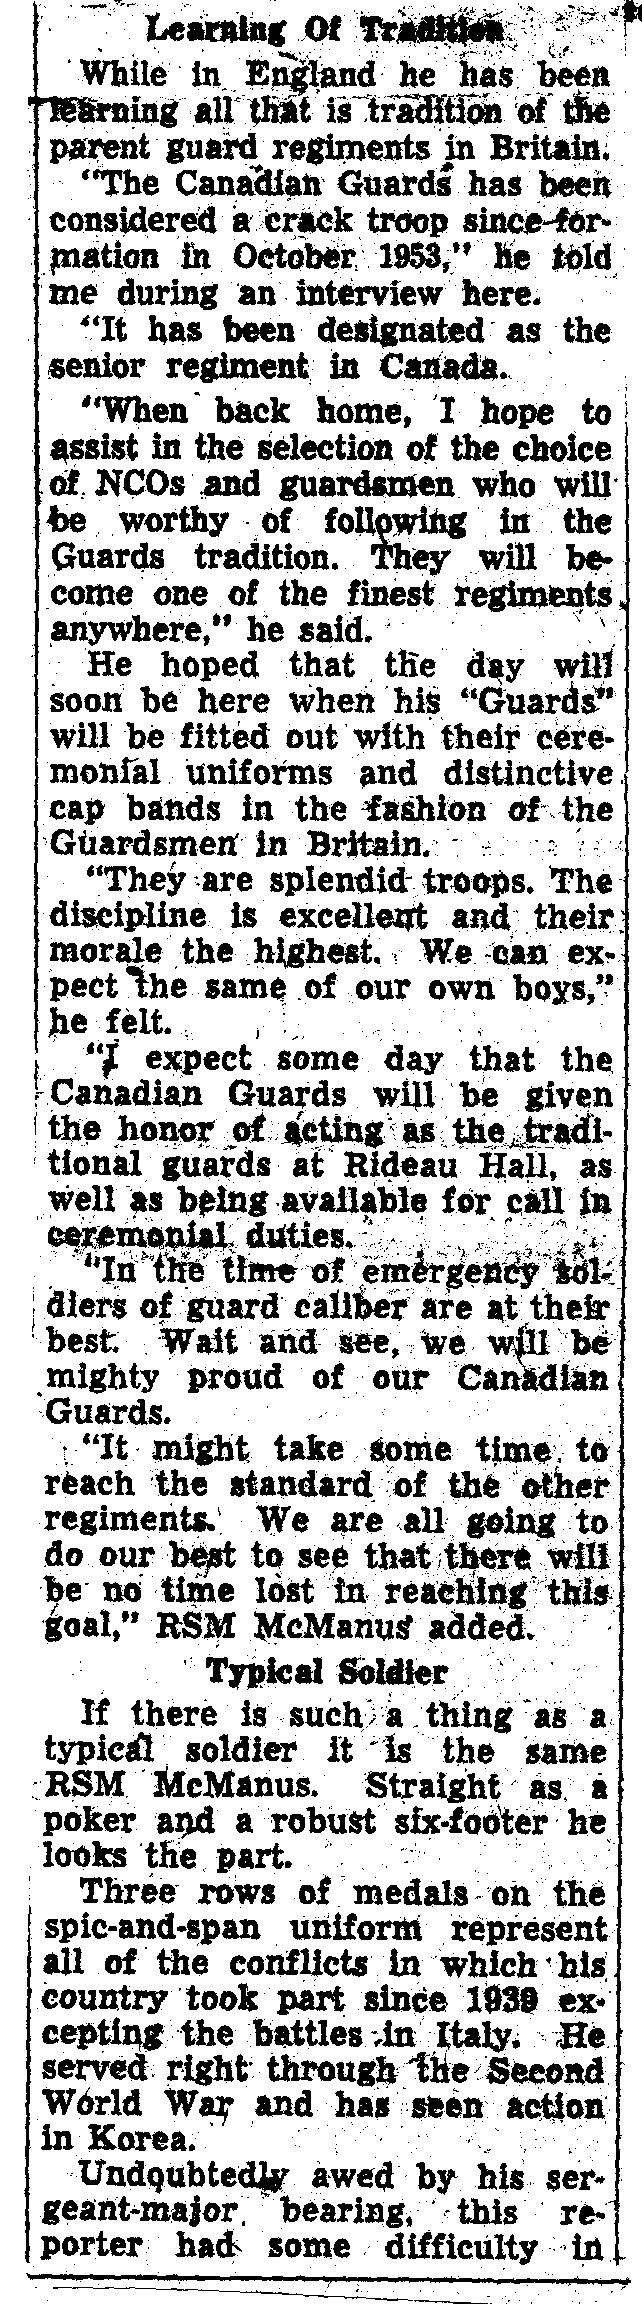 6_Caterham-Ottawa Citizen-more-August-17-1954